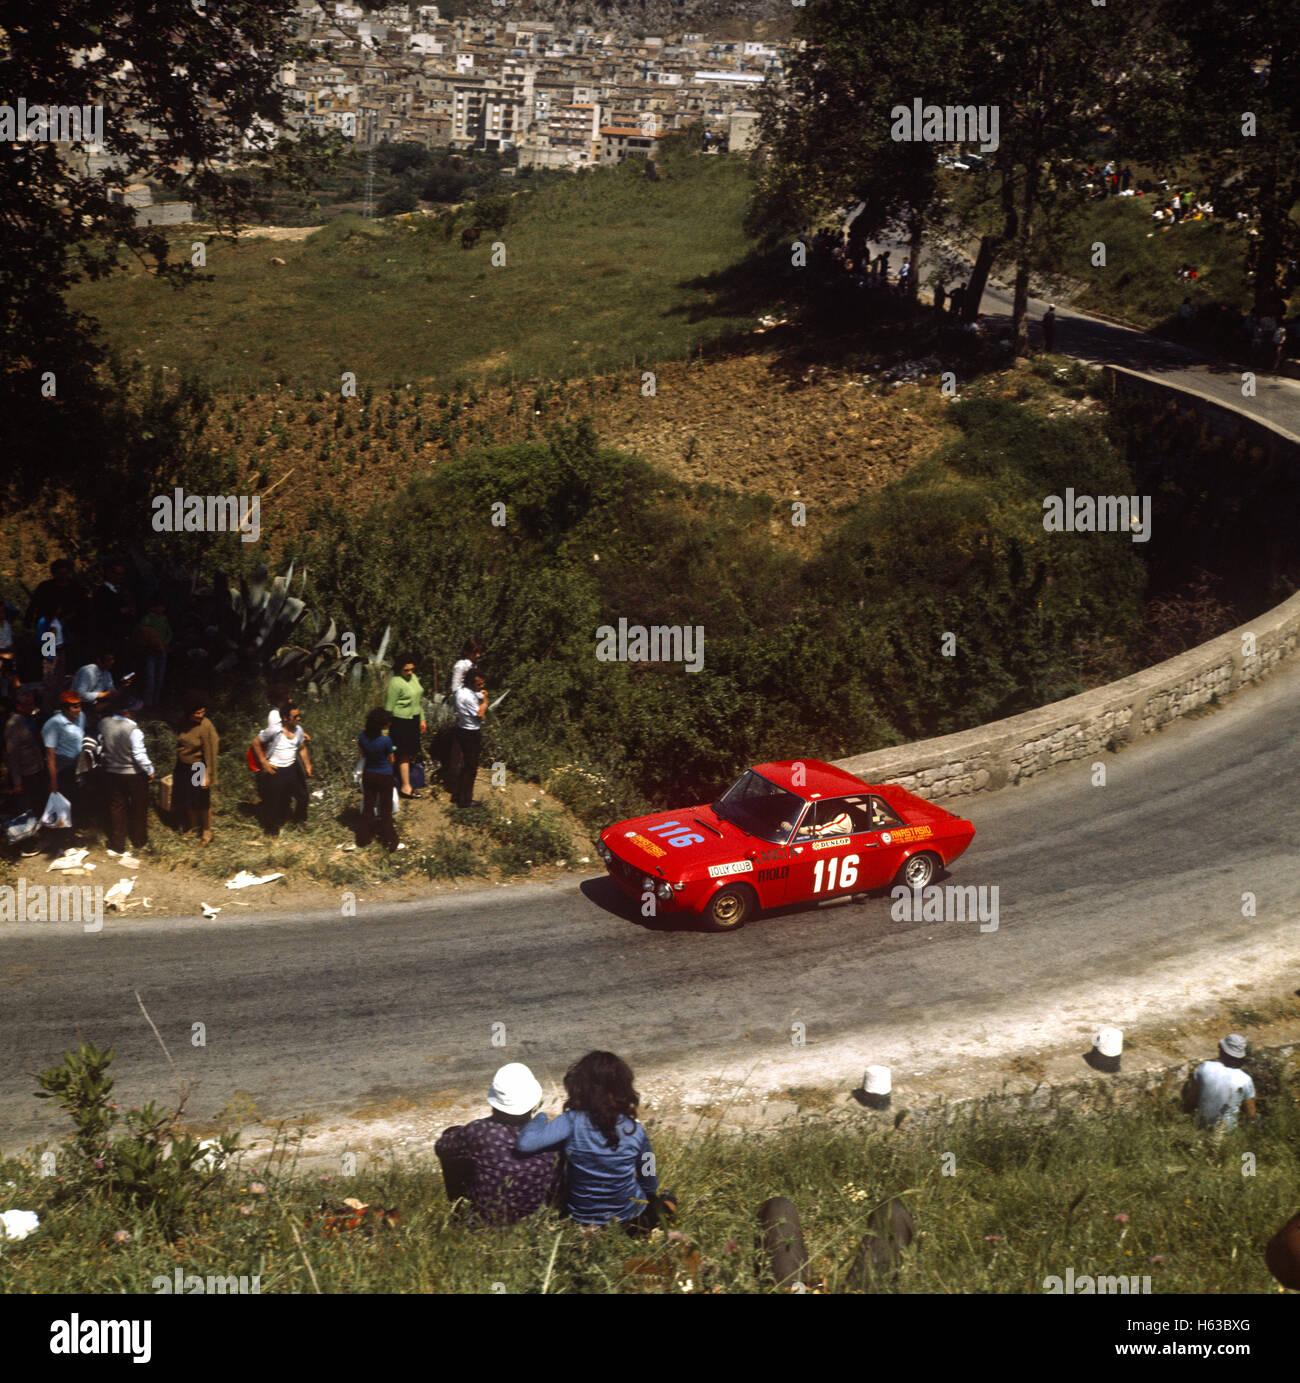 116 Pasquale Anastasio and Fiorenzo Genta in a Lancia Fulvia Sport Competizione finished 21st in the Targa Florio - Stock Image